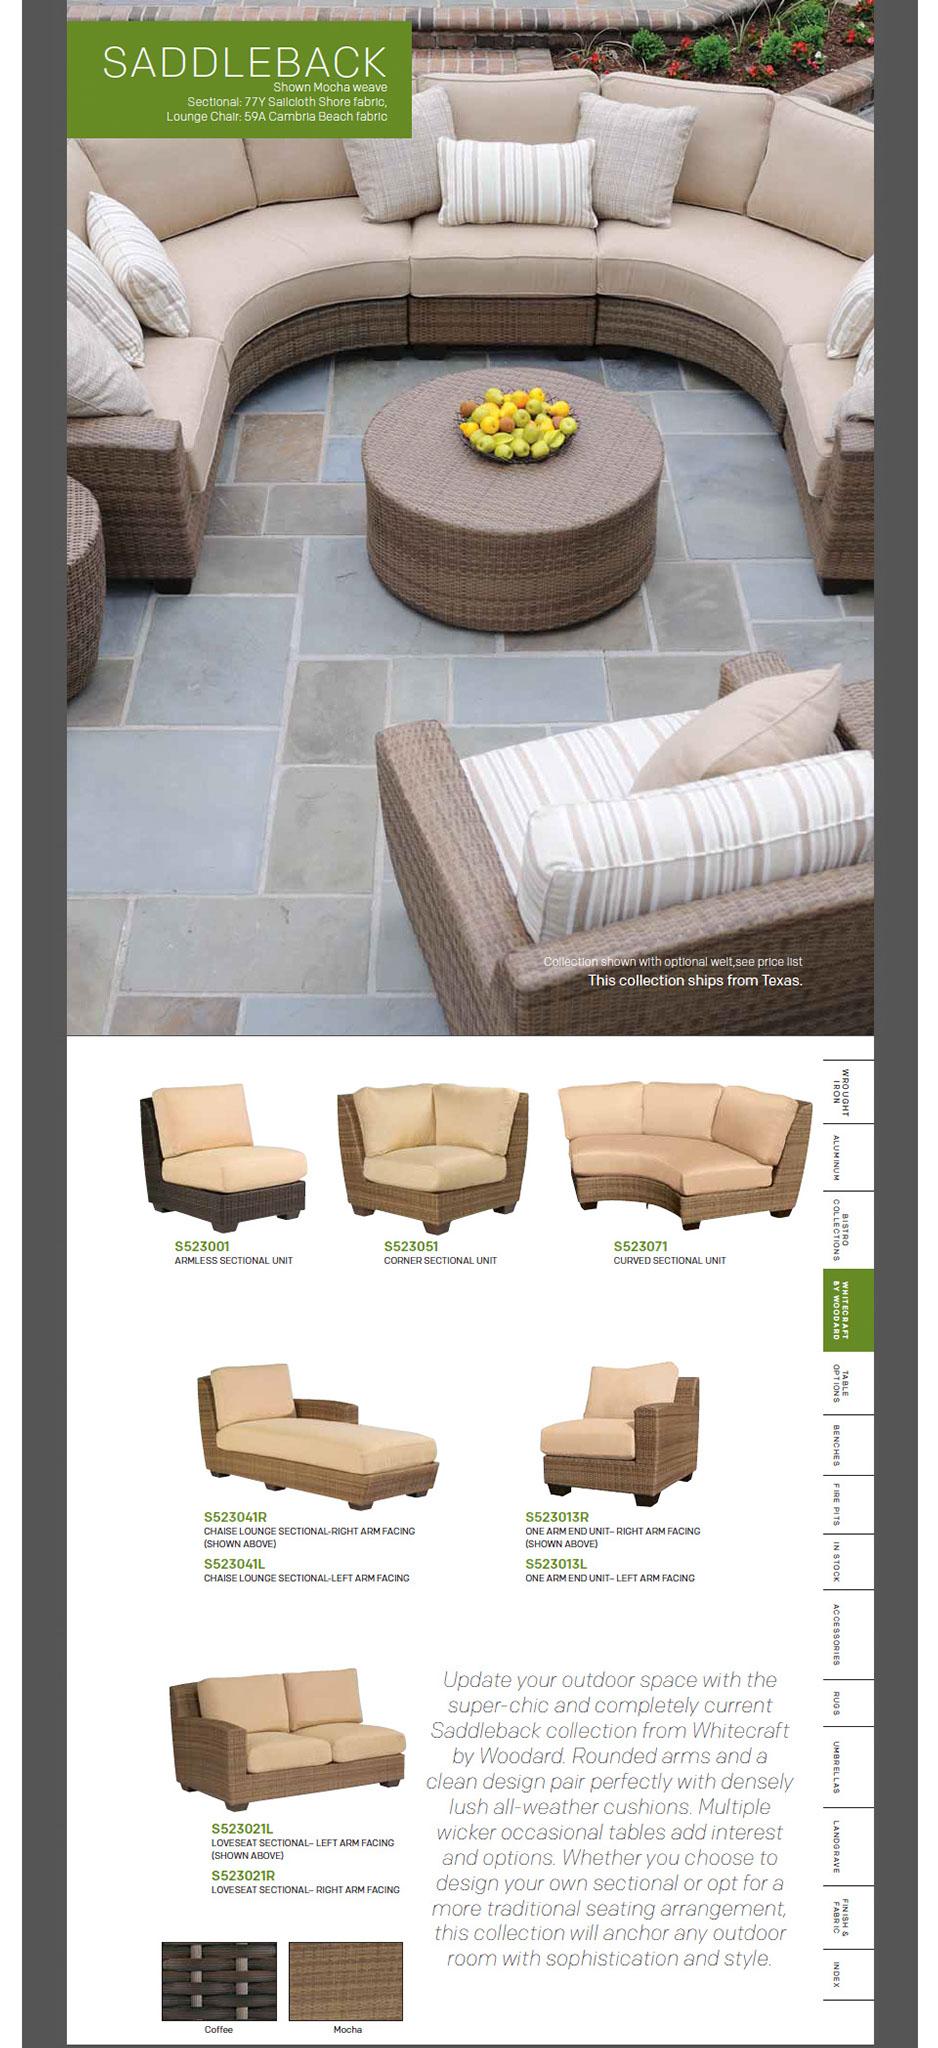 Saddleback Outdoor Patio Furniture